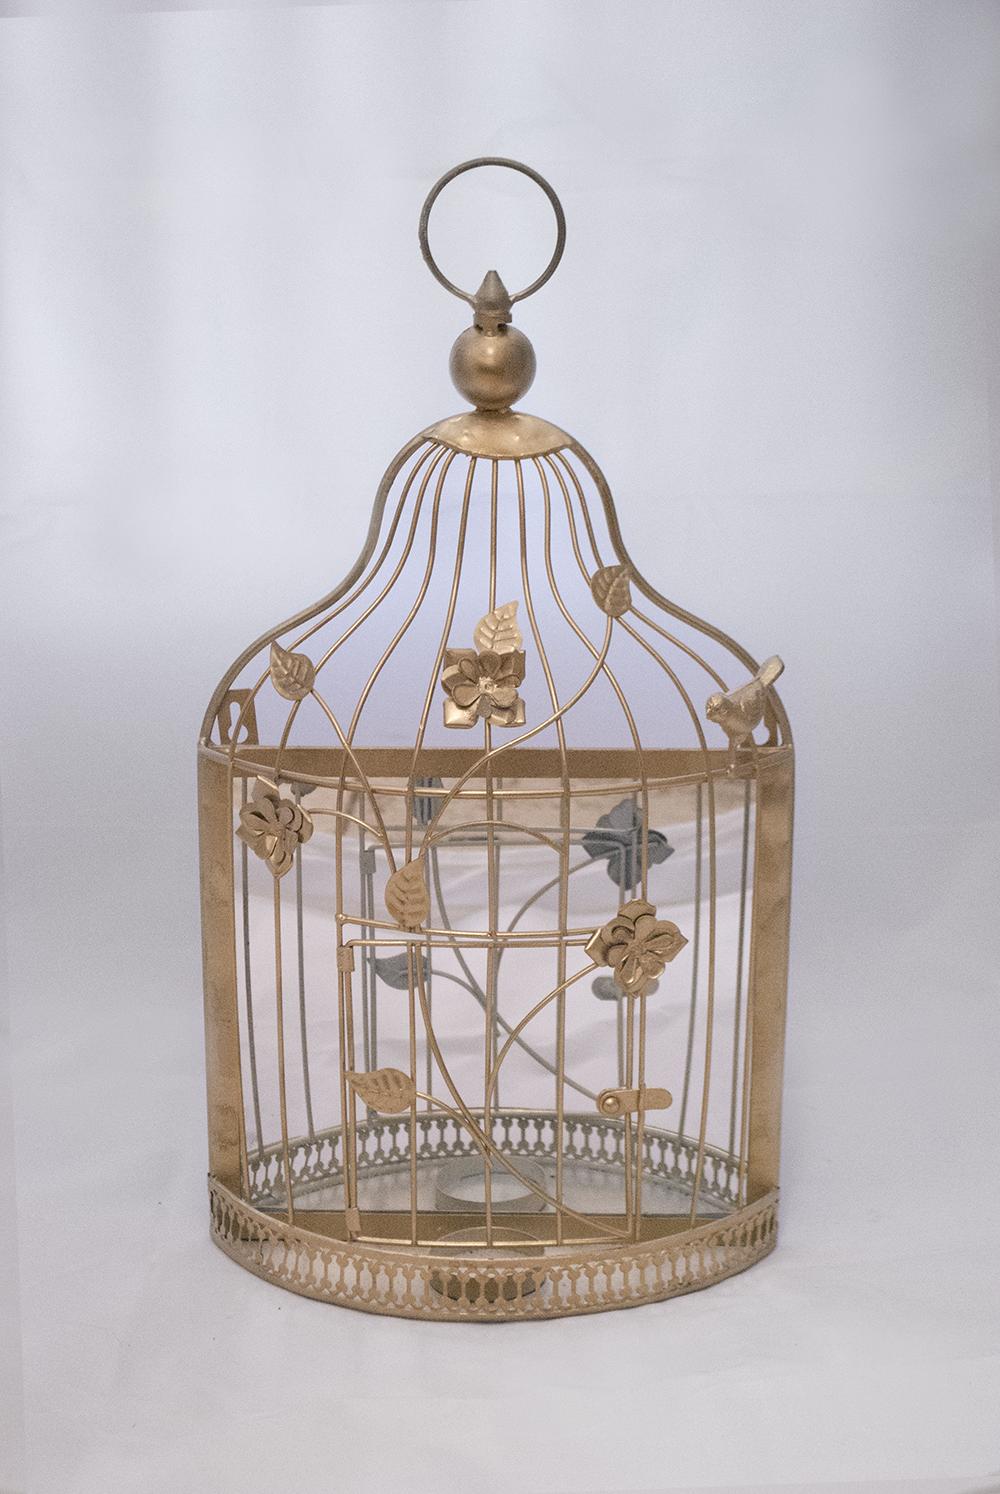 Flat Back / Gold birdcage mirror   Quantity: 4  Price: $17.00